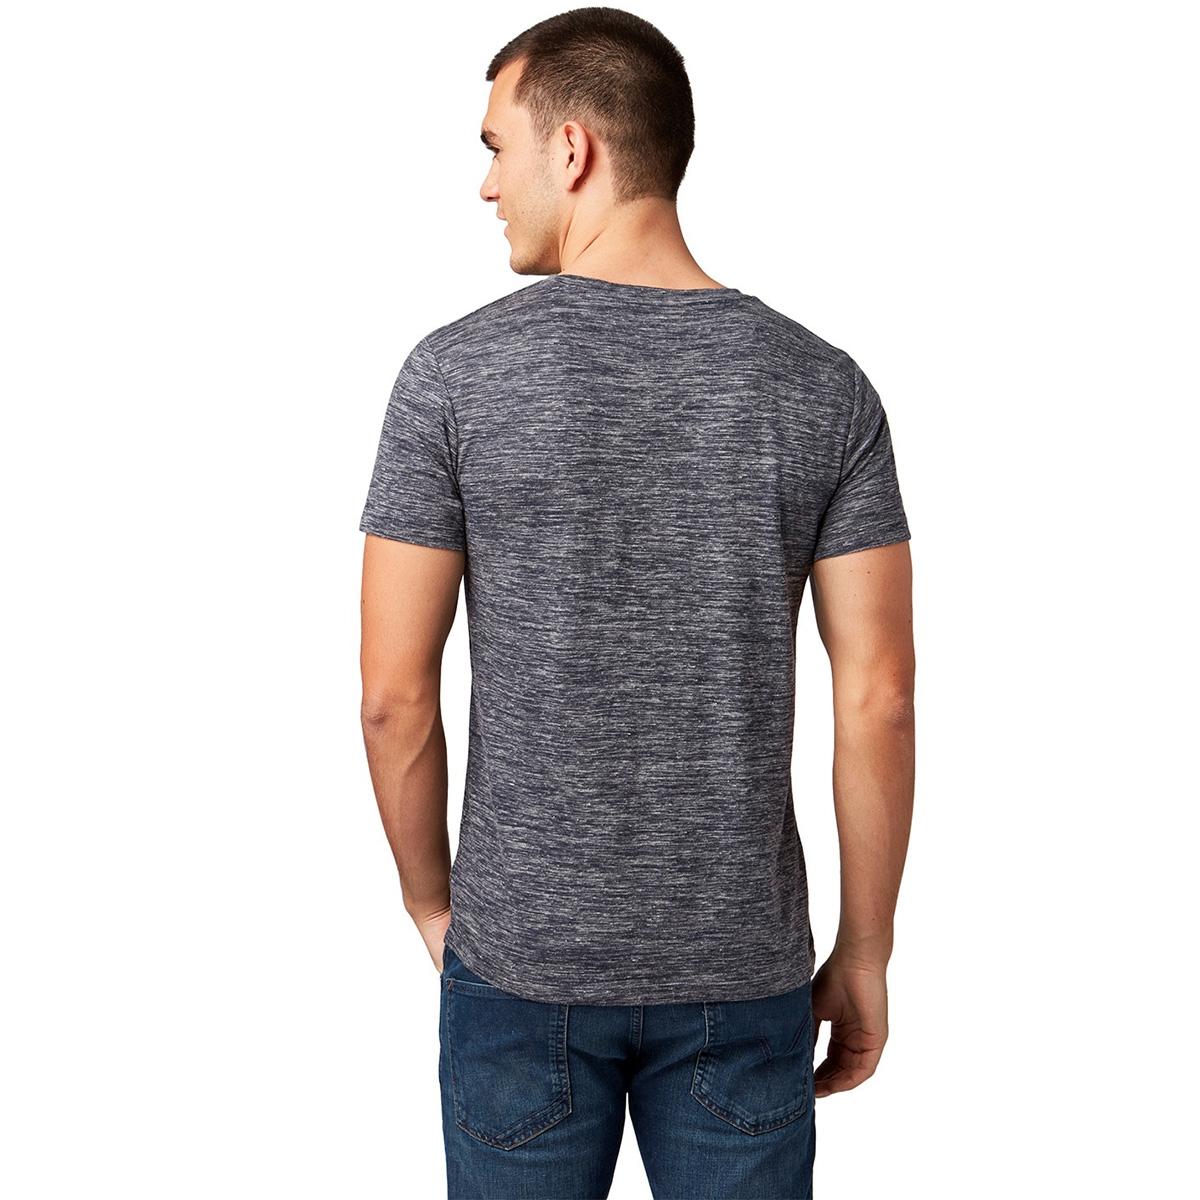 1009207xx12 Tom Tailor T-shirt 14591